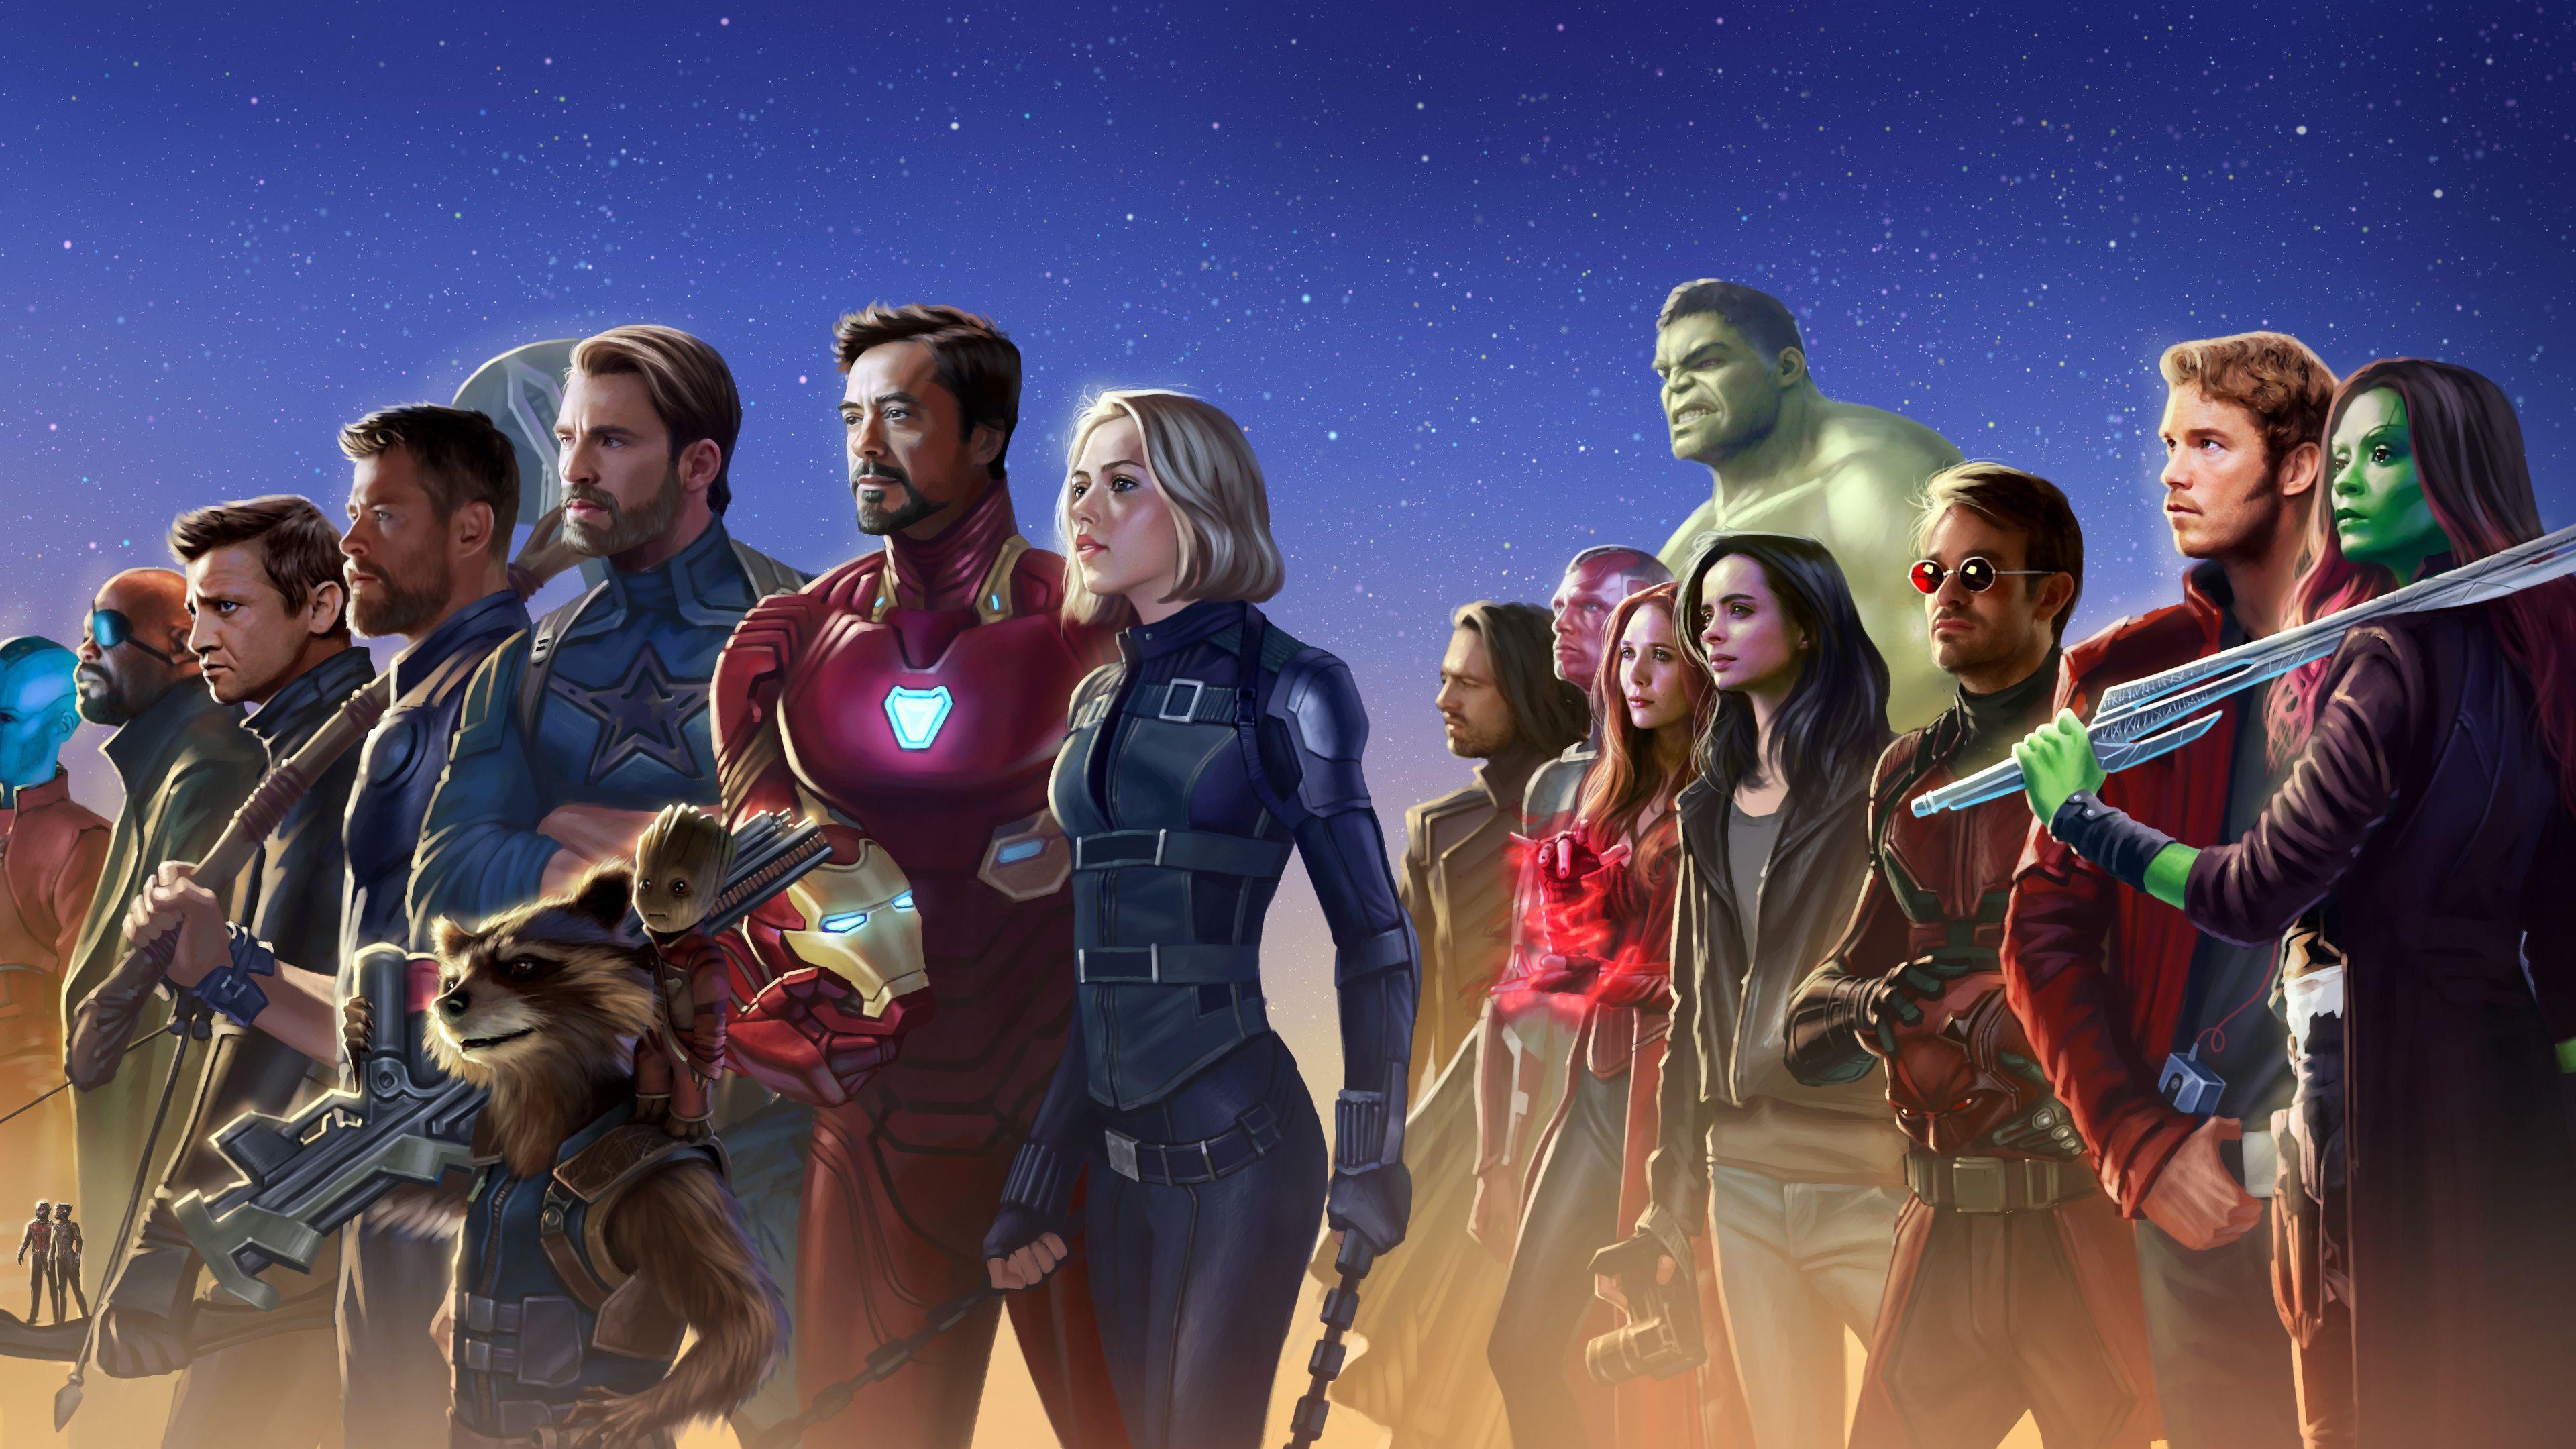 Avengers Infinity War 4k 5k Movies Wallpapers Hd Wallpapers Deviantart Wallpapers Avengers Infinity War Wallpape Marvel Superheroes Marvel Avengers Avengers